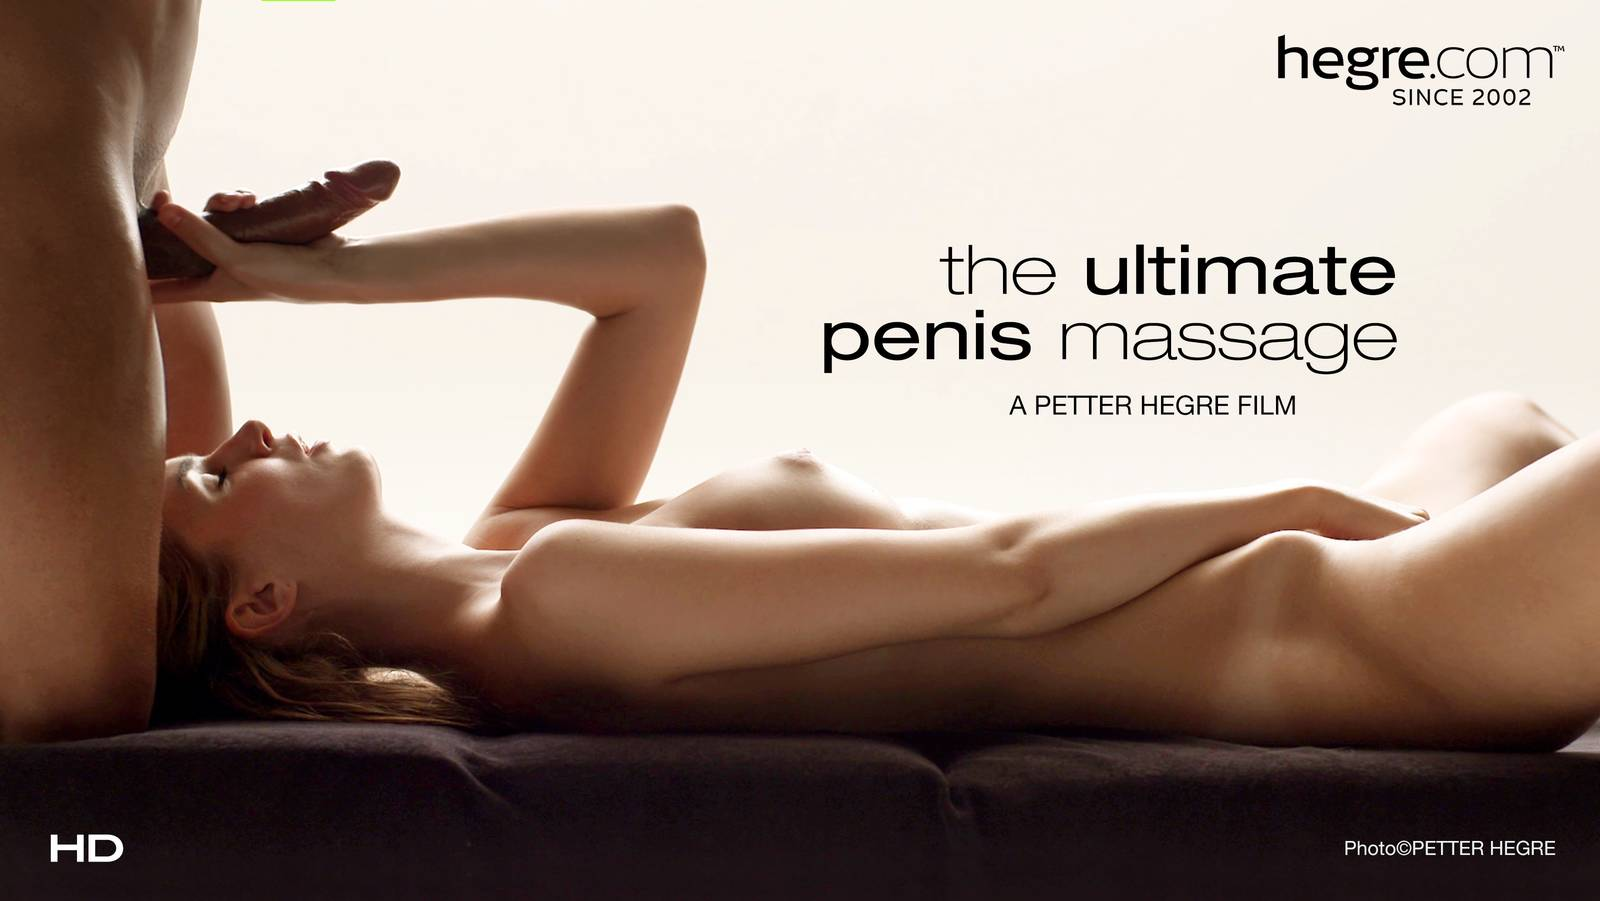 The Ultimate Penis Massage - Hegre.com